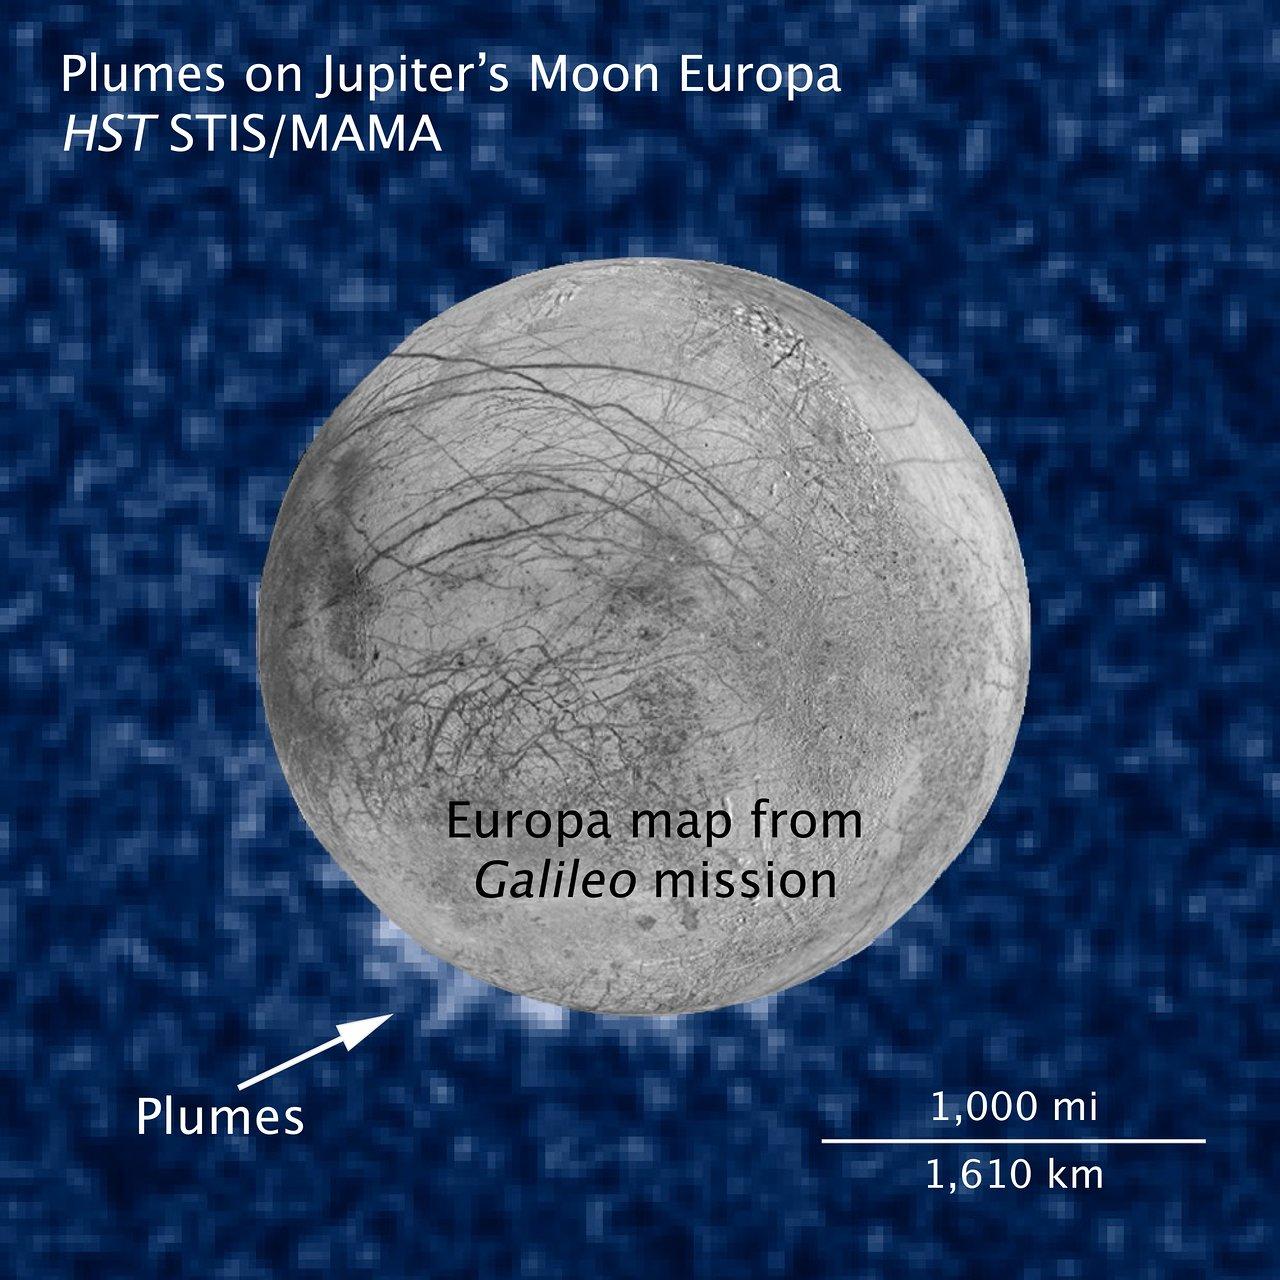 1567214318510-HST_Europa_plumes_opo1633b_1280.jpg